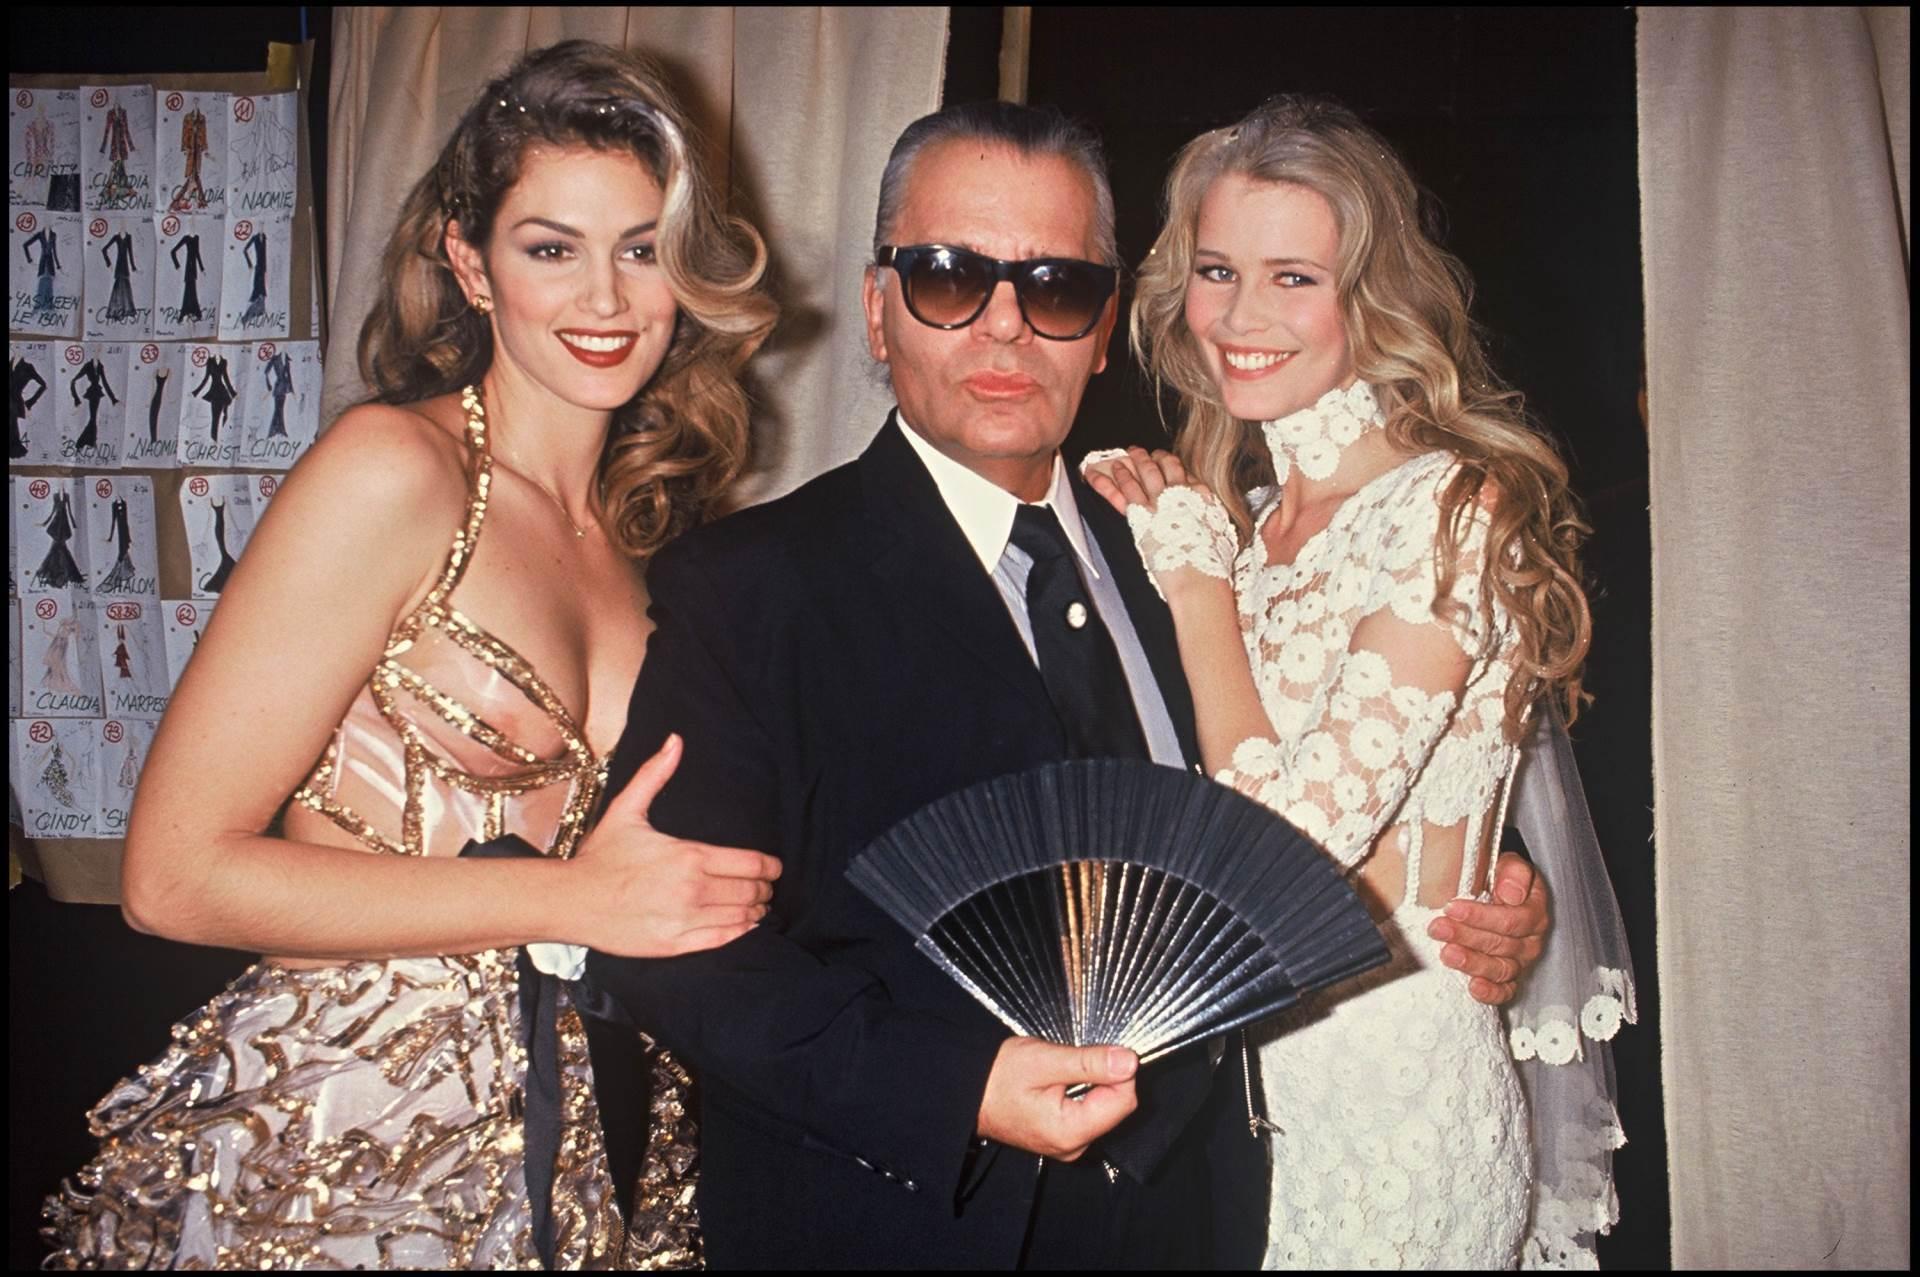 Cindy Crawford, Karl Lagerfeld, Claudia Schiffer